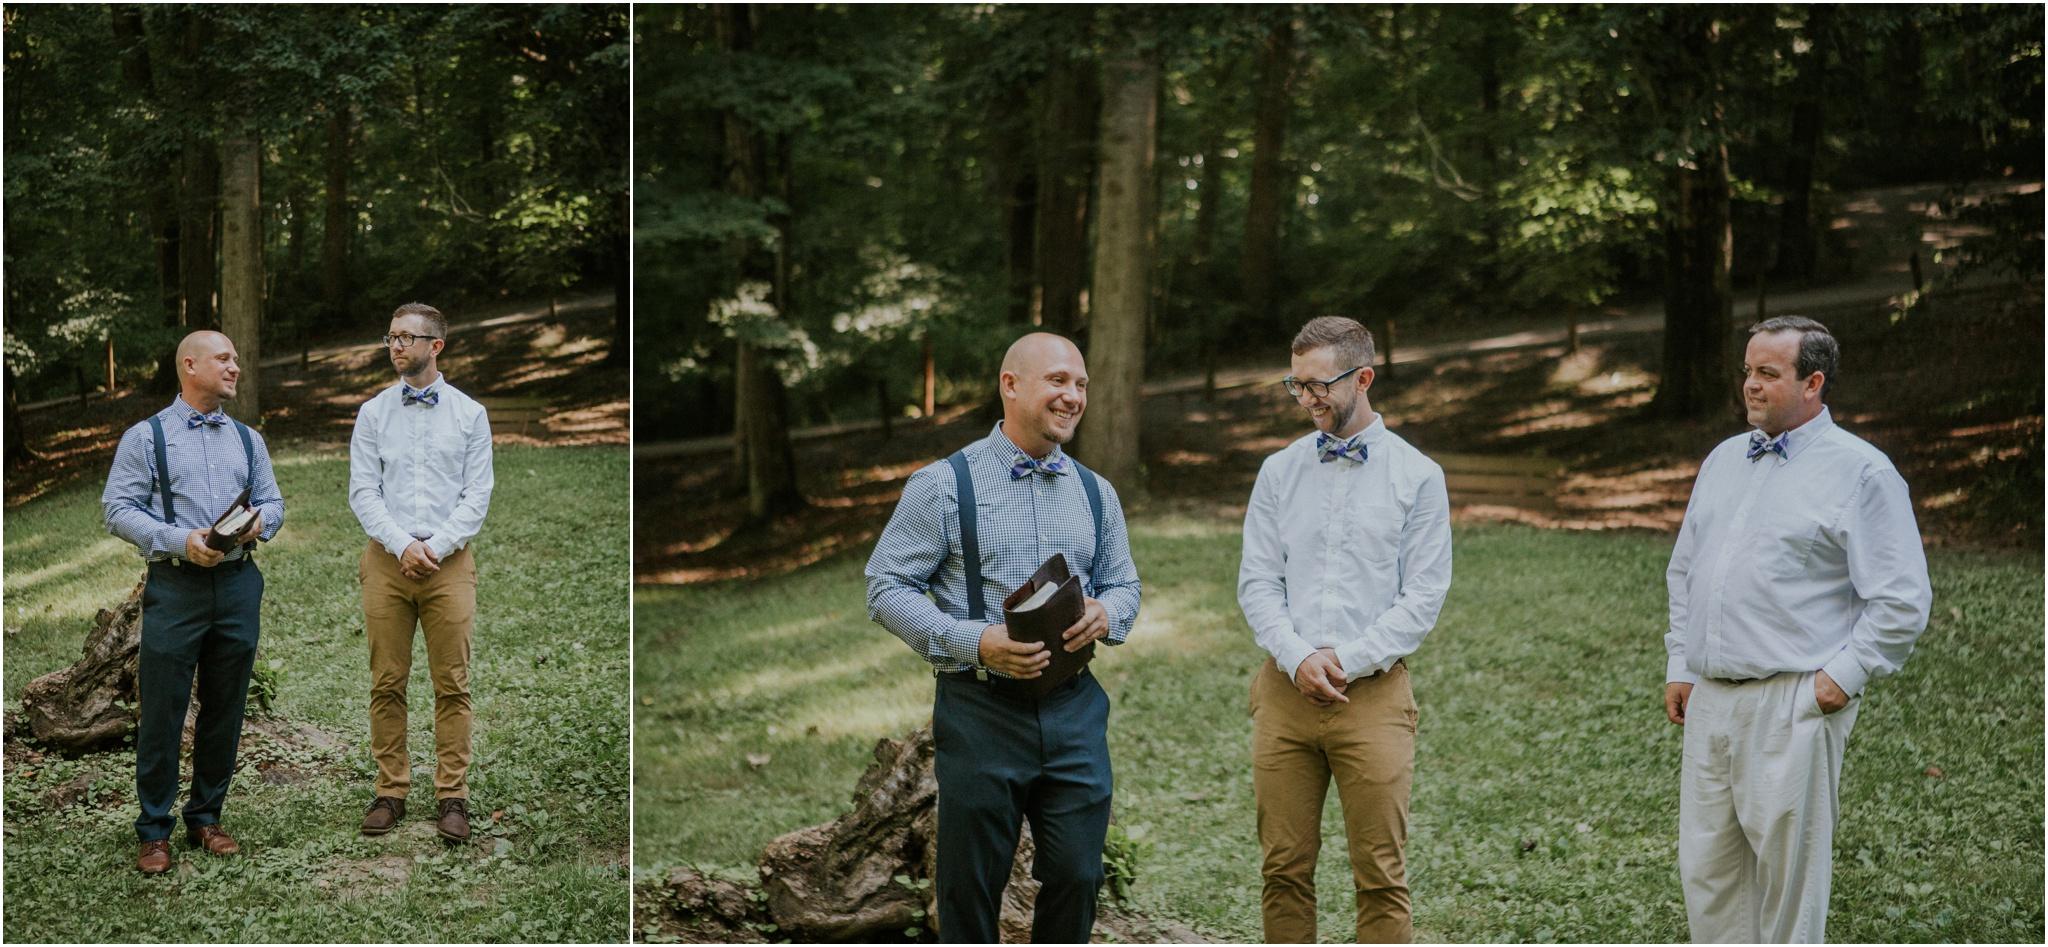 sugar-hollow-park-bristol-virginia-wedding-intimate-woodsy-black-forest-ceremony-adventurous-couple_0010.jpg